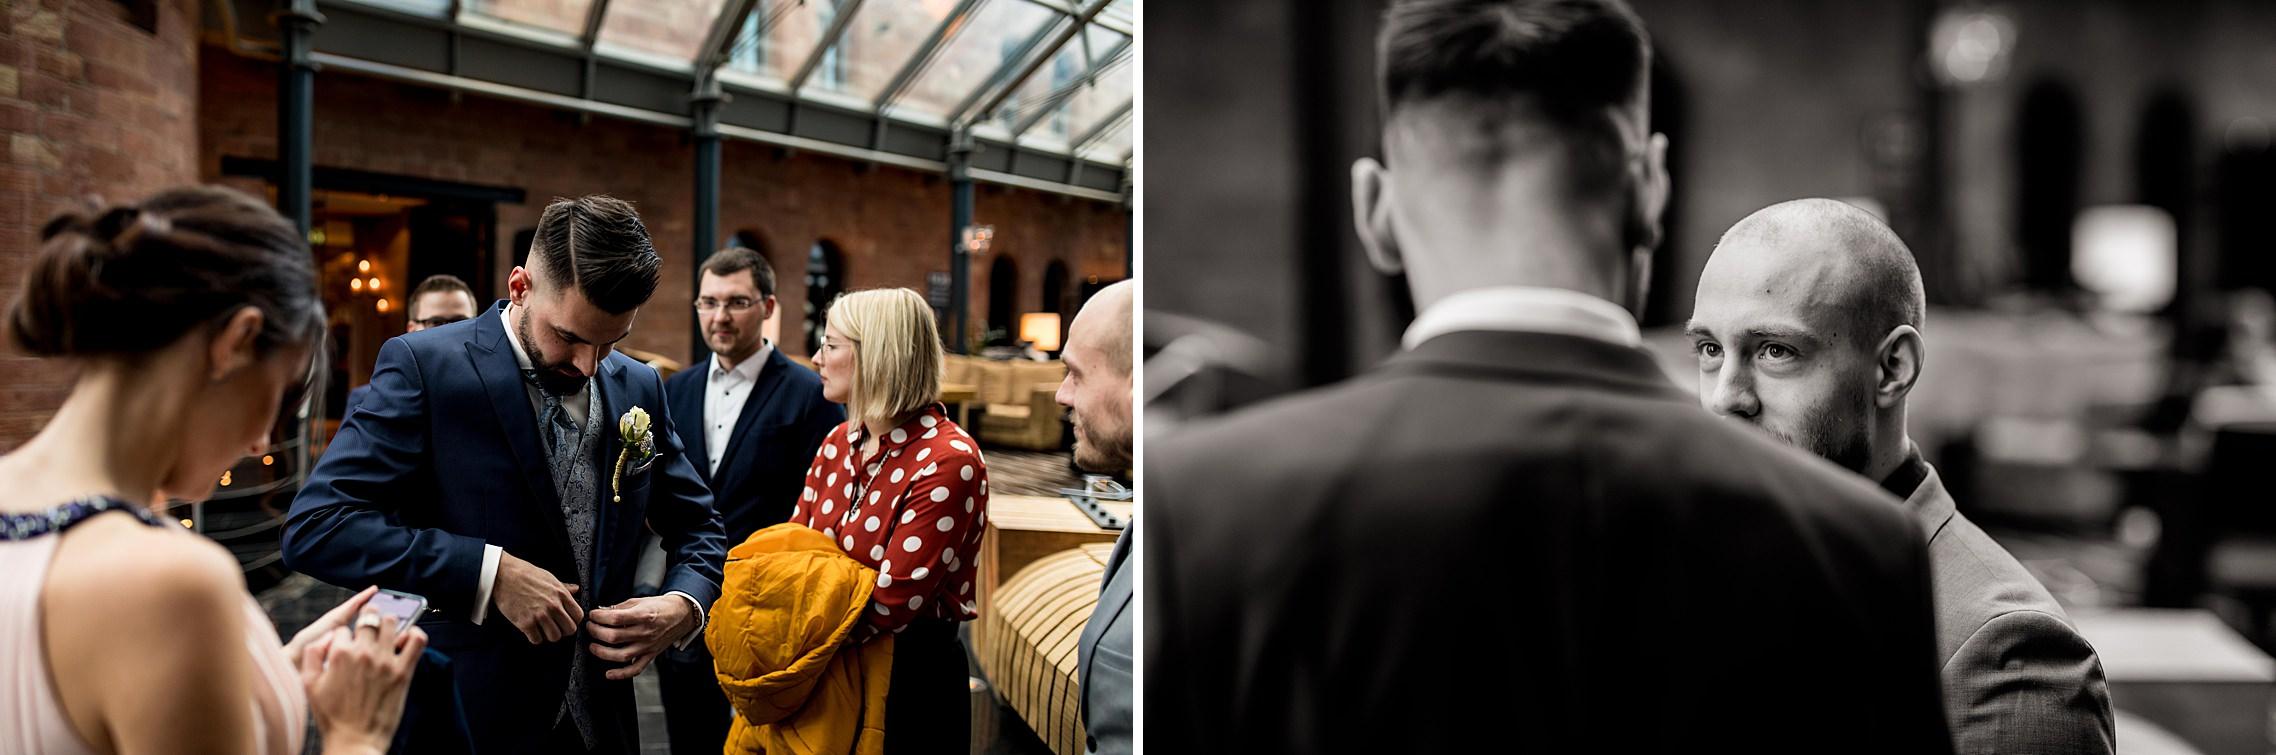 Bräutigam kurz vor Trauzeremonie im Hyatt Regency Mainz